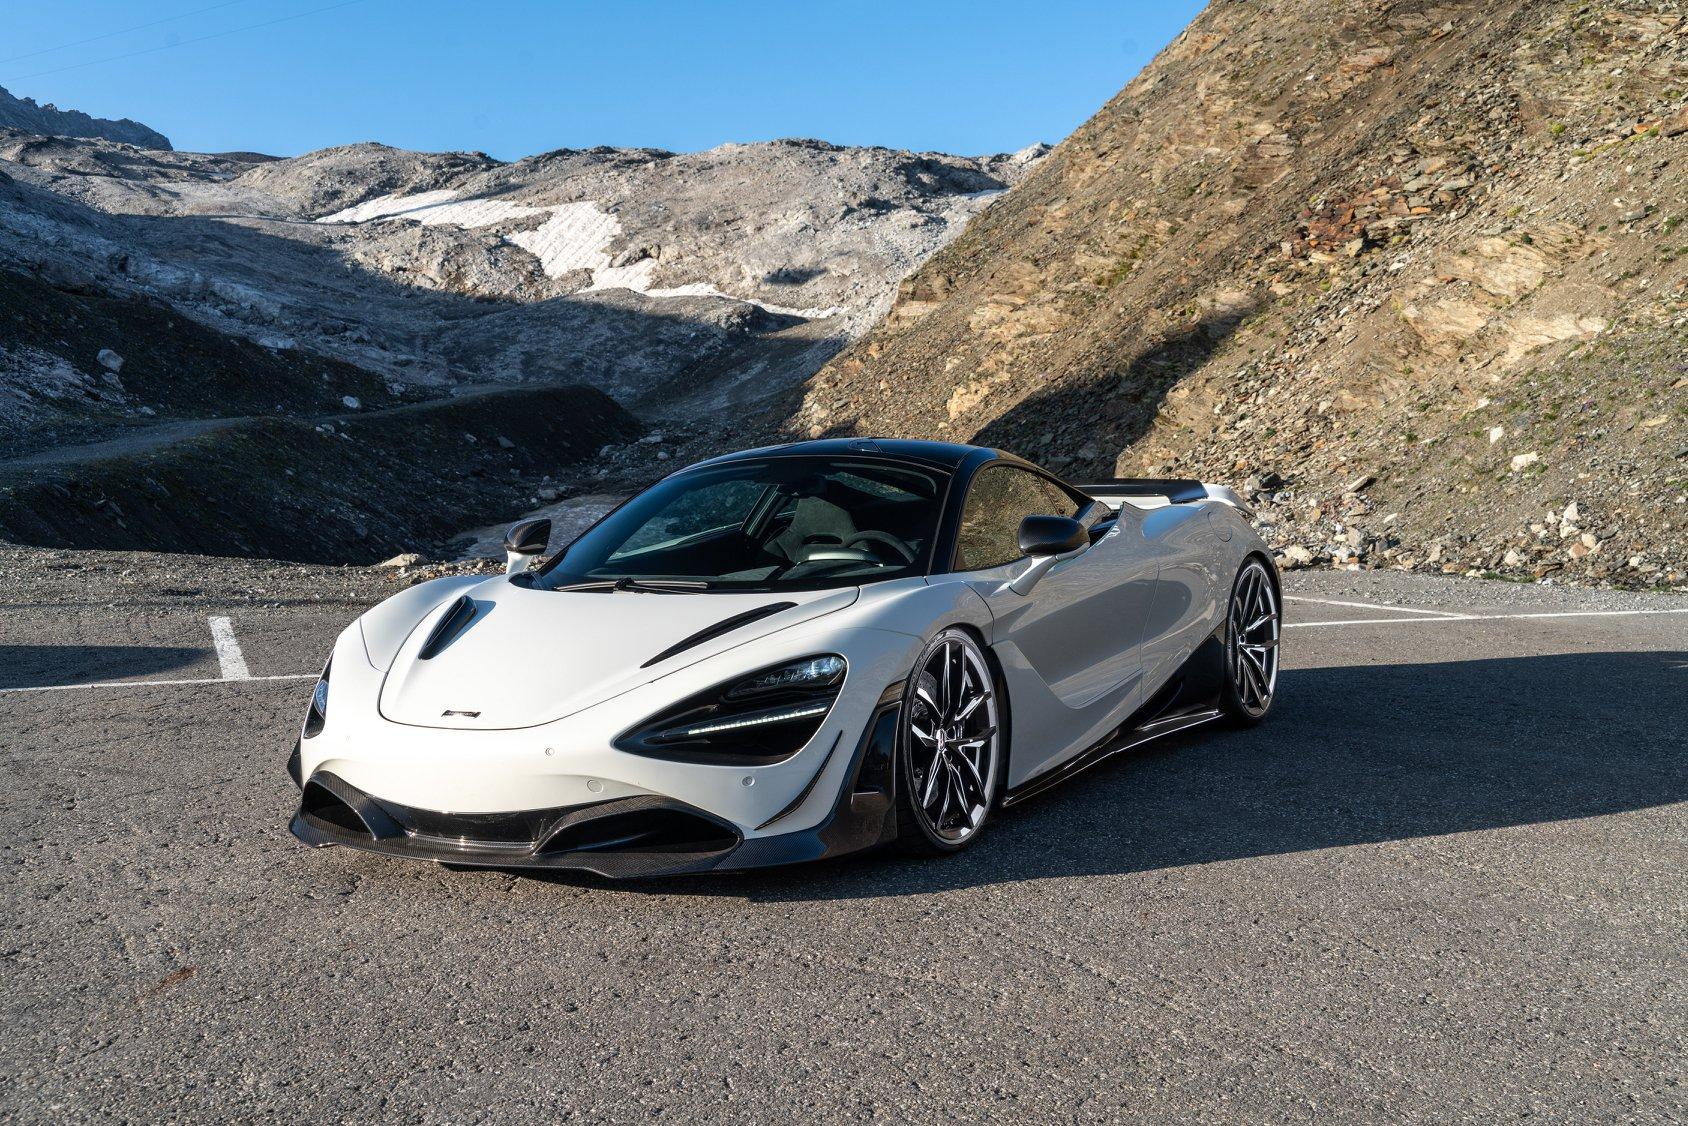 Novitec Reveals Upgraded McLaren 720S